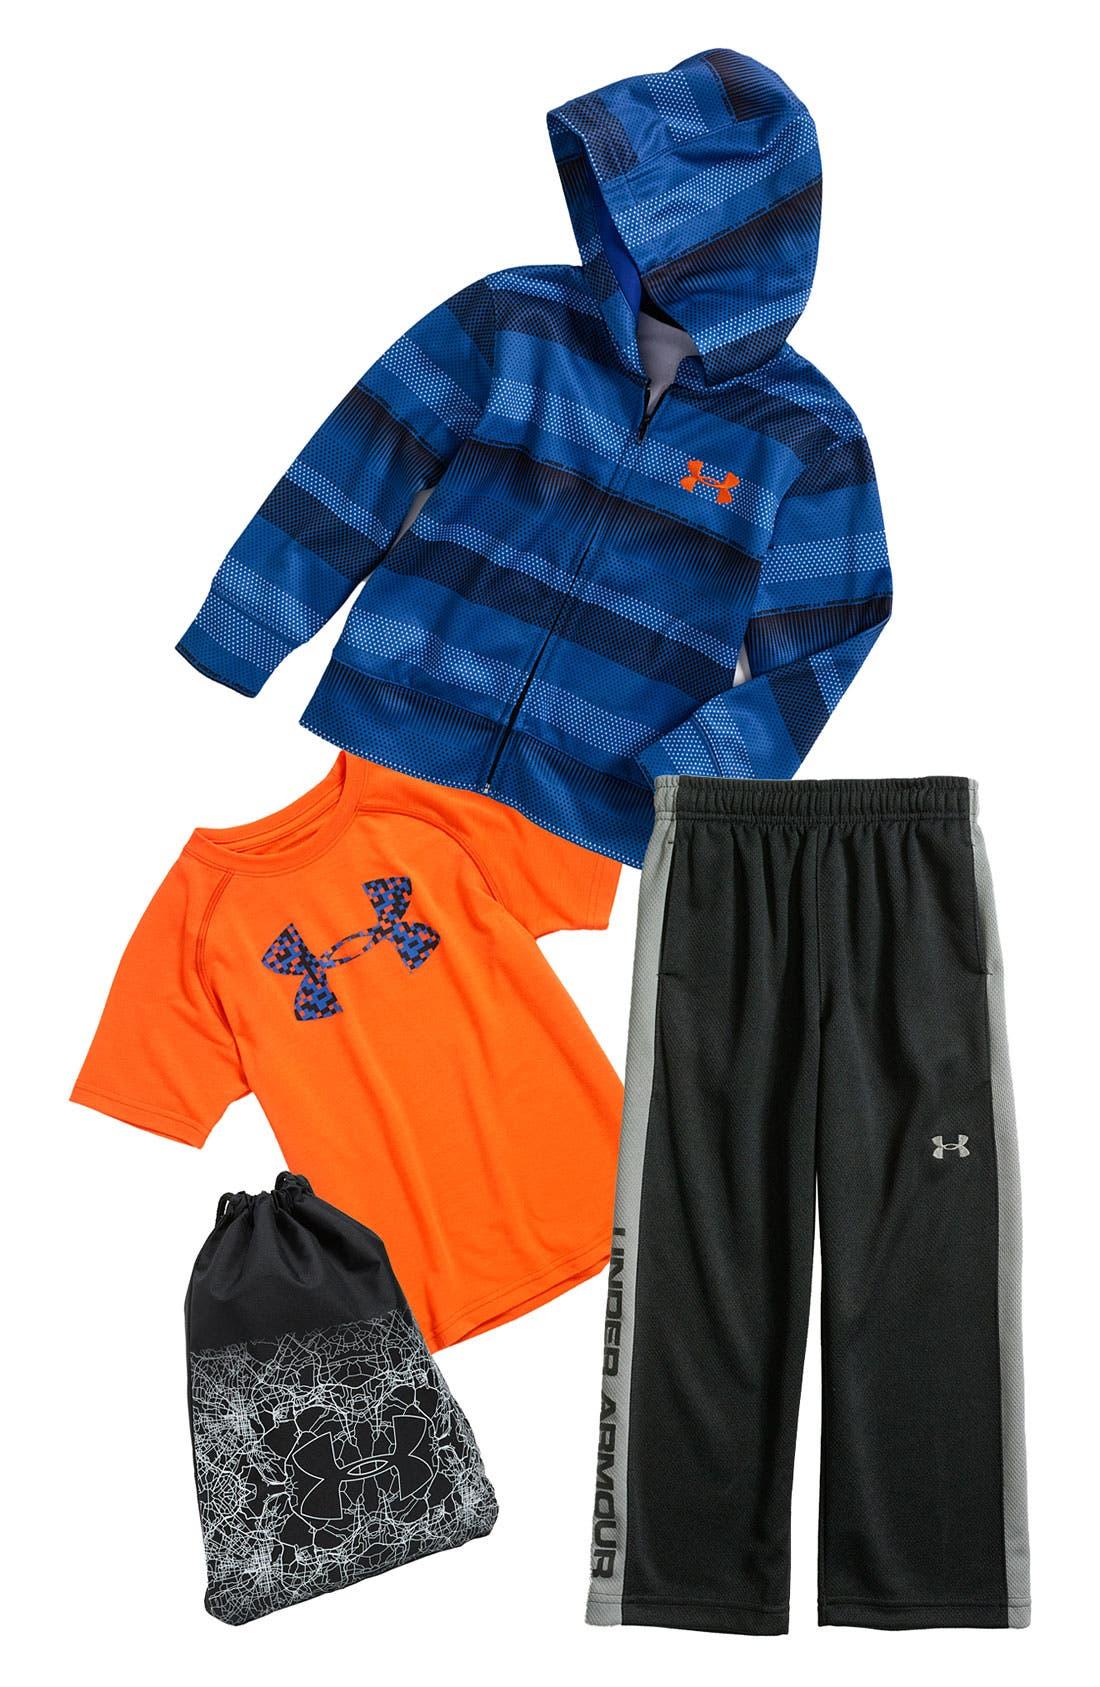 Main Image - Under Armour T-Shirt, Hoodie & Pants (Little Boys)